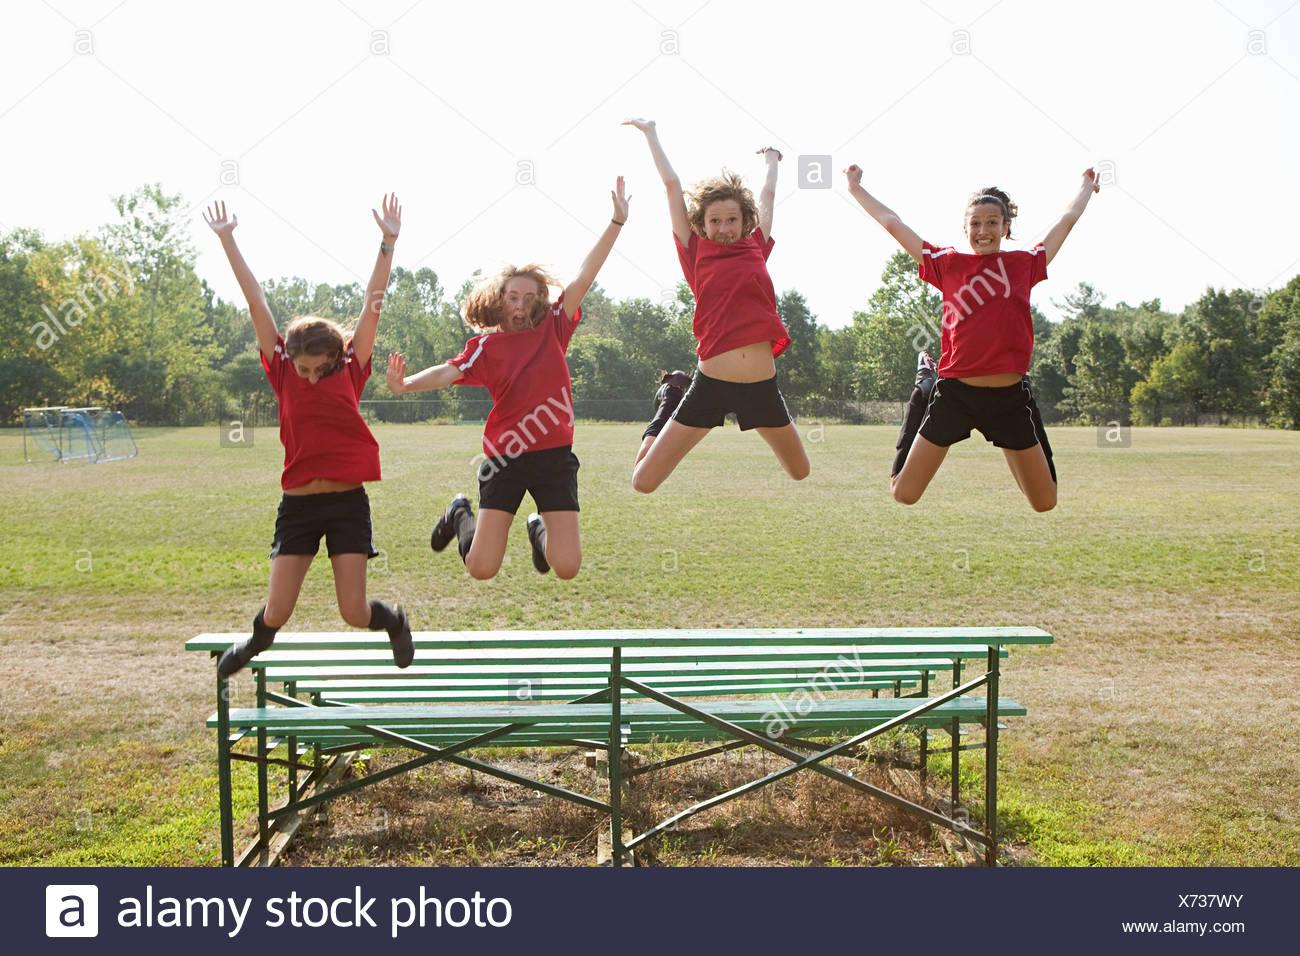 Jugadores de fútbol chica saltando de gradas Imagen De Stock